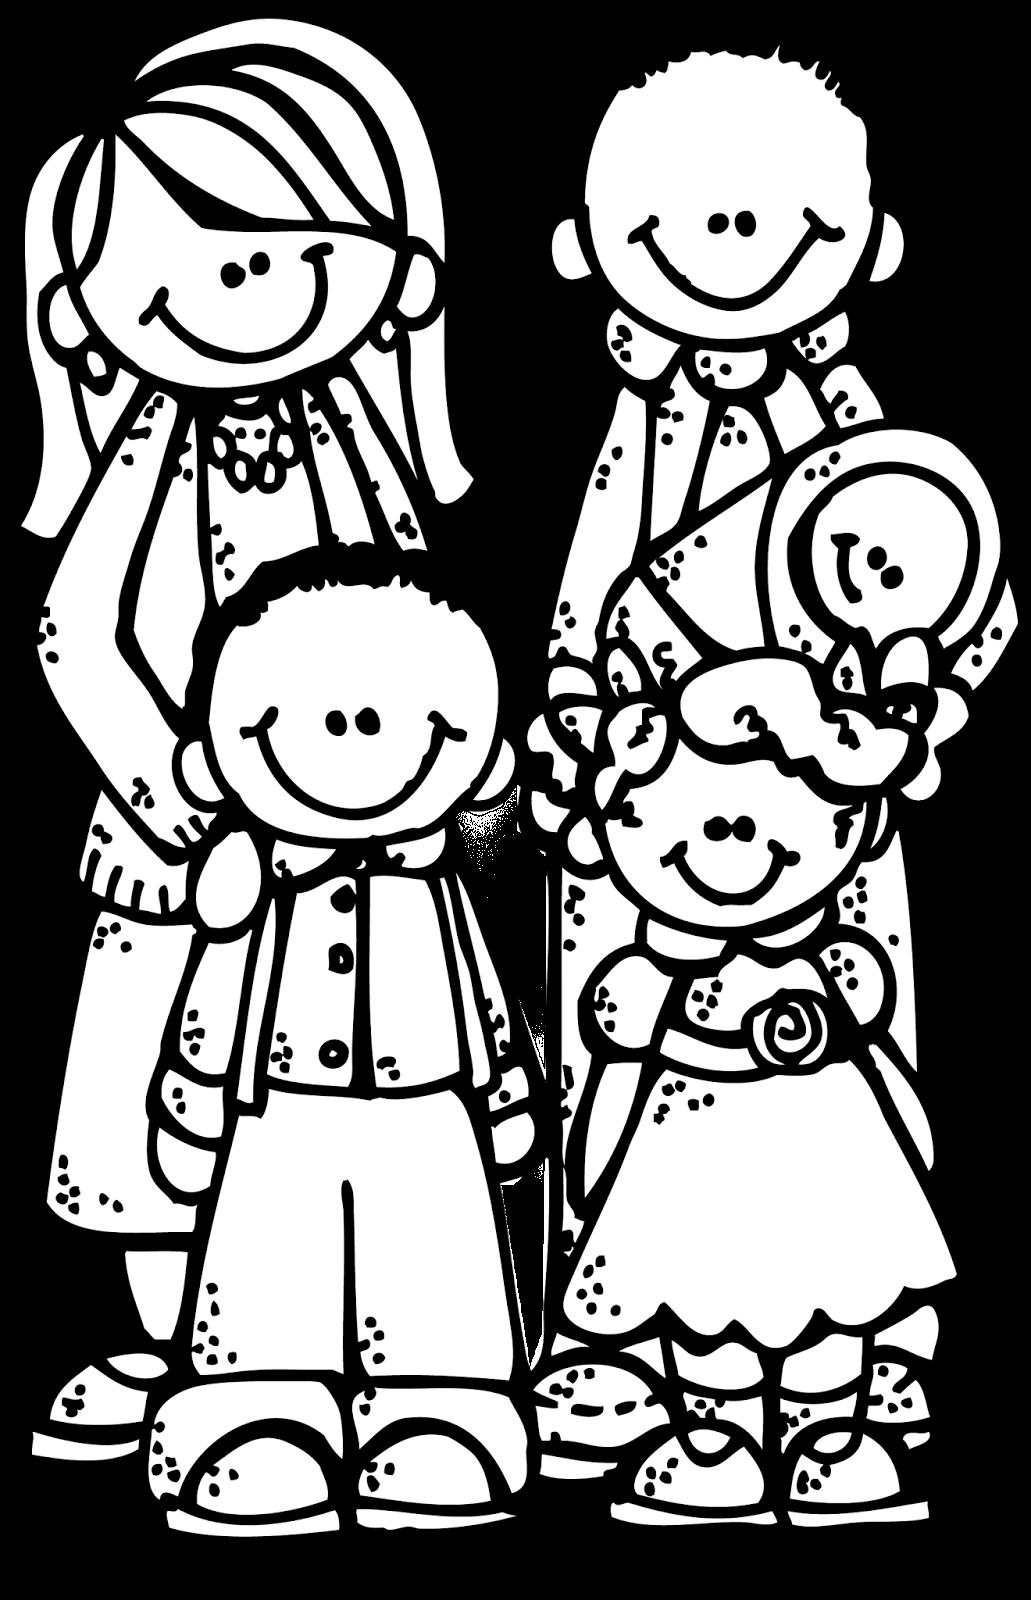 Melonheadz Lds Illustrating New Eternal Family Graphics